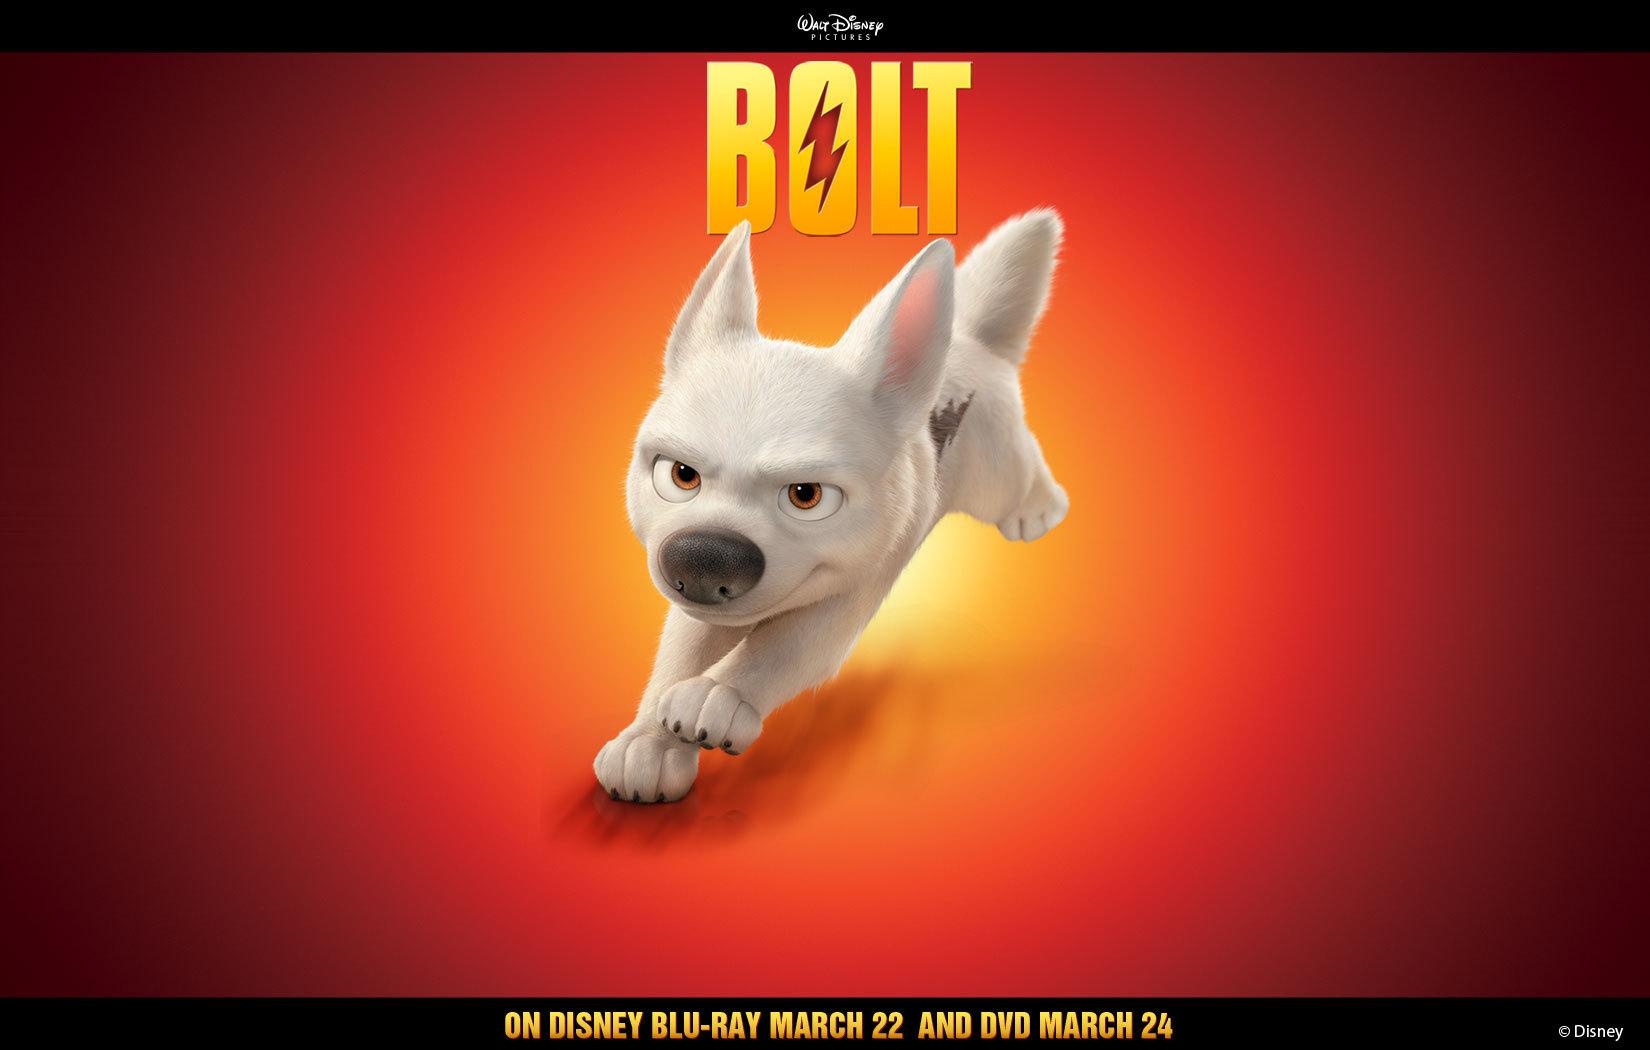 Bolt Solo Wallpaper Disney S Bolt Photo 5566700 HD Wallpapers Download Free Images Wallpaper [1000image.com]